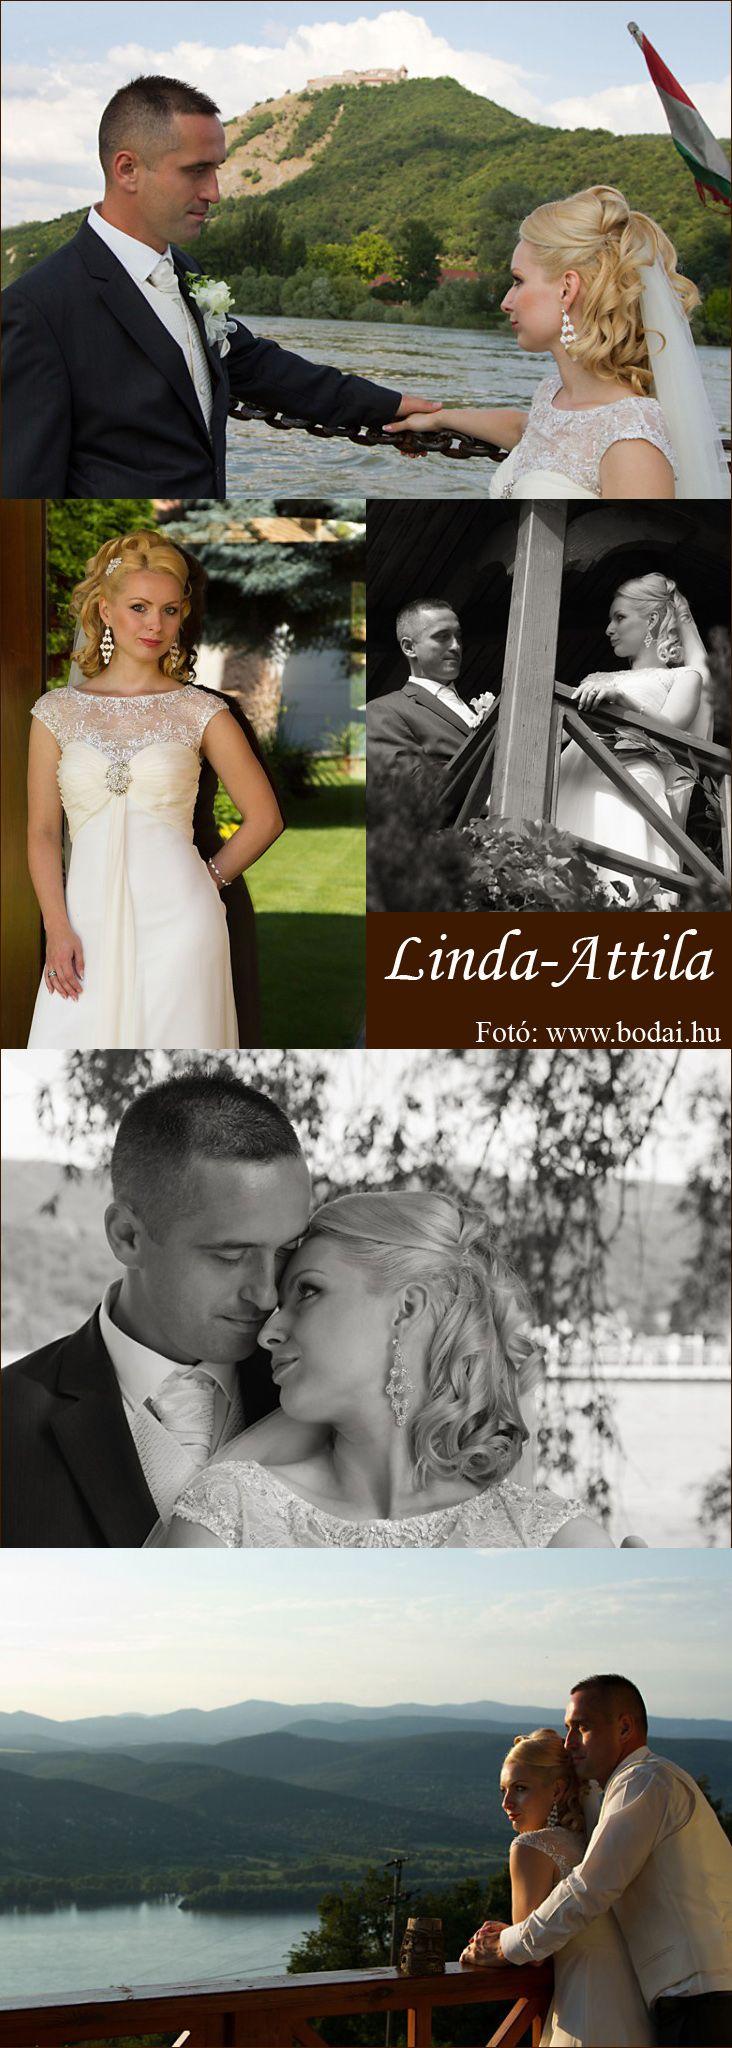 Esküvői fotók Visegrádon  http://www.bodai.hu